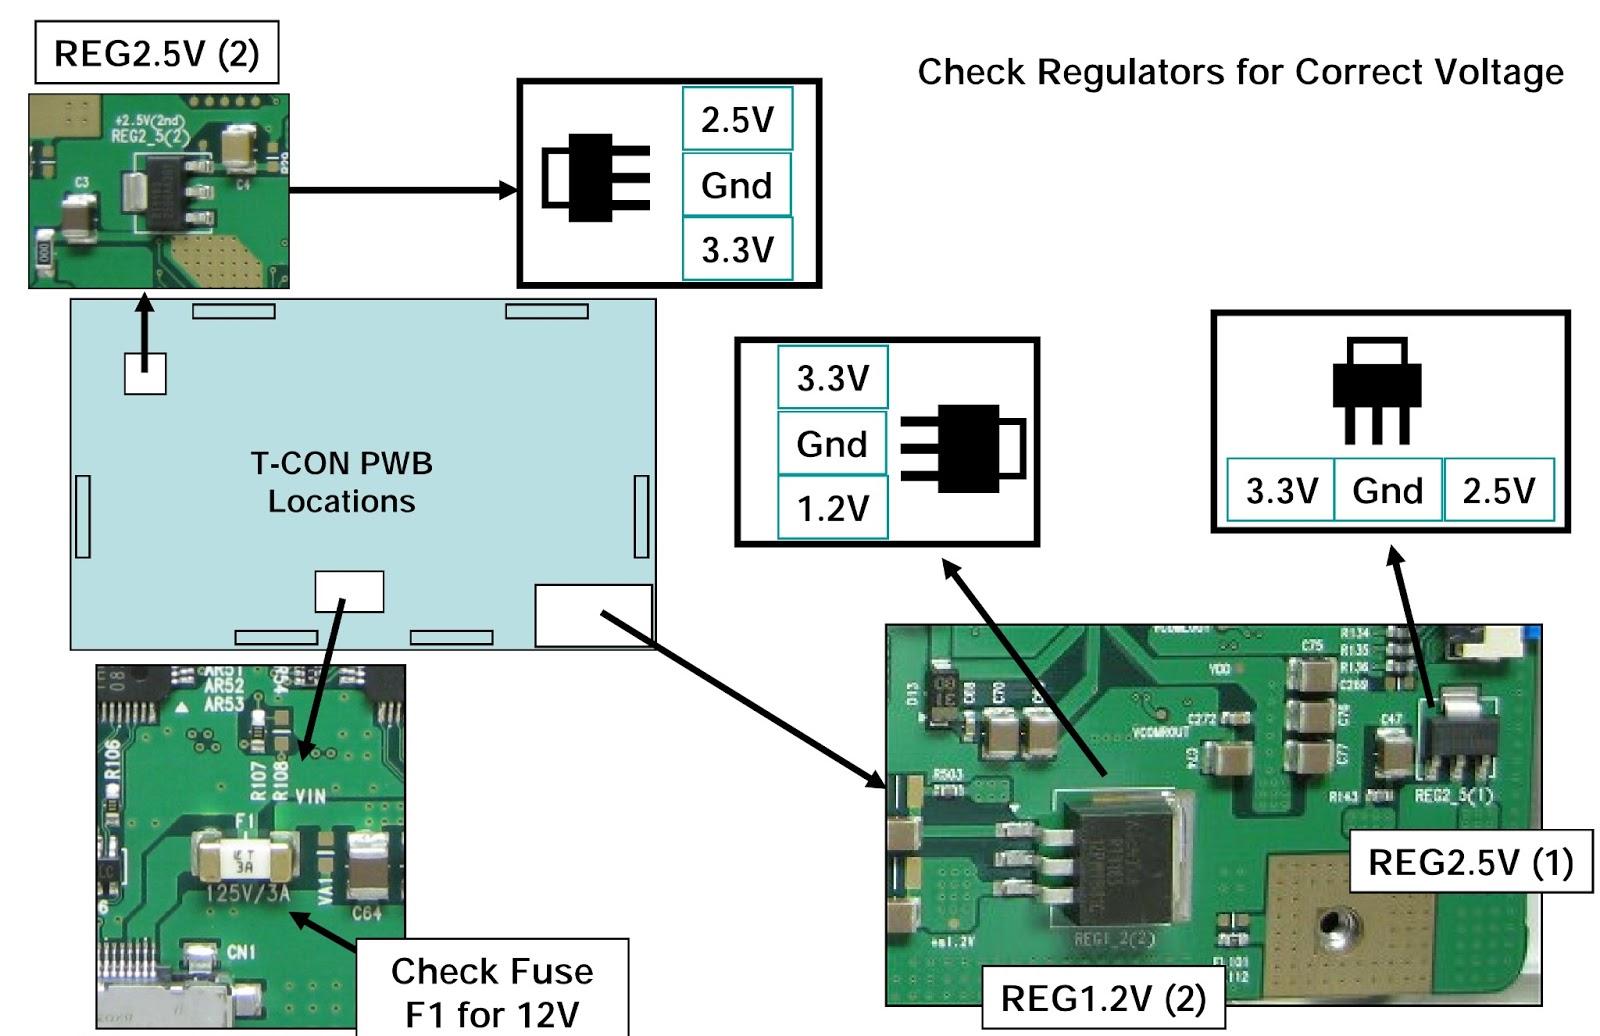 lg 47lg90 led lcd tv t con board voltage check fuse check circuit board computer t con board circuit diagram [ 1600 x 1036 Pixel ]